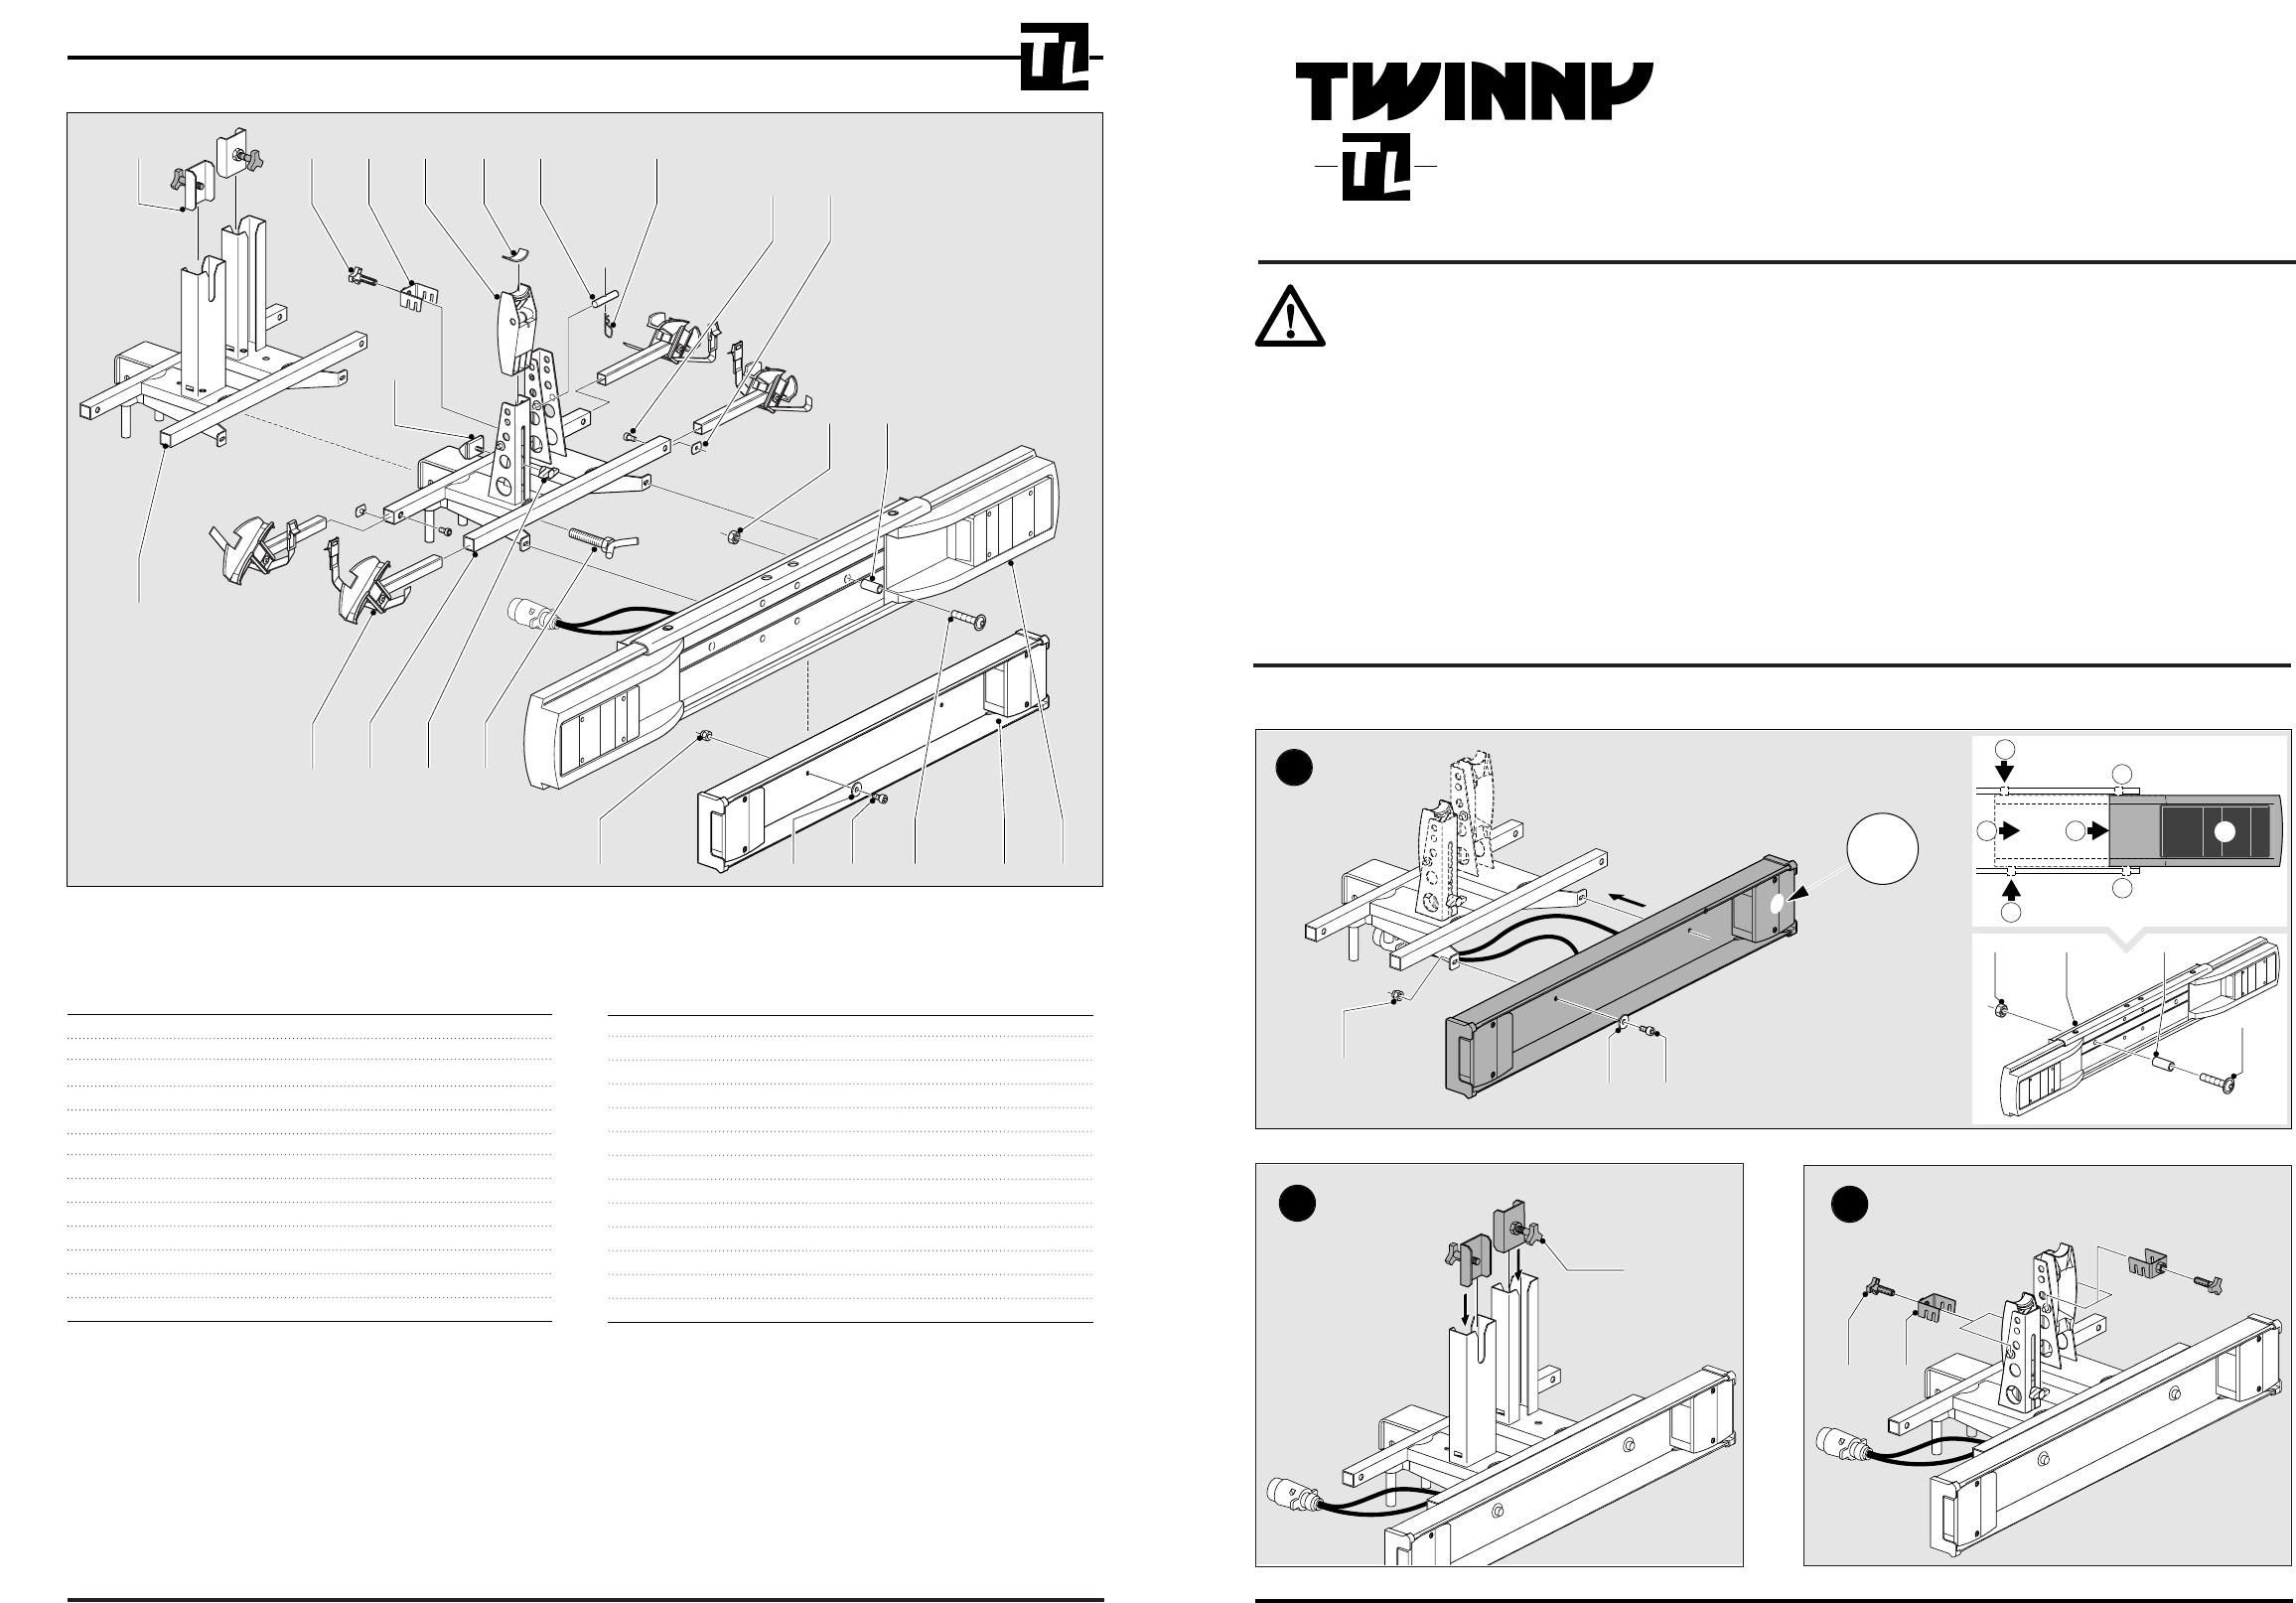 Verrassend Handleiding Twinny Load Basis (pagina 1 van 2) (Nederlands) GO-56